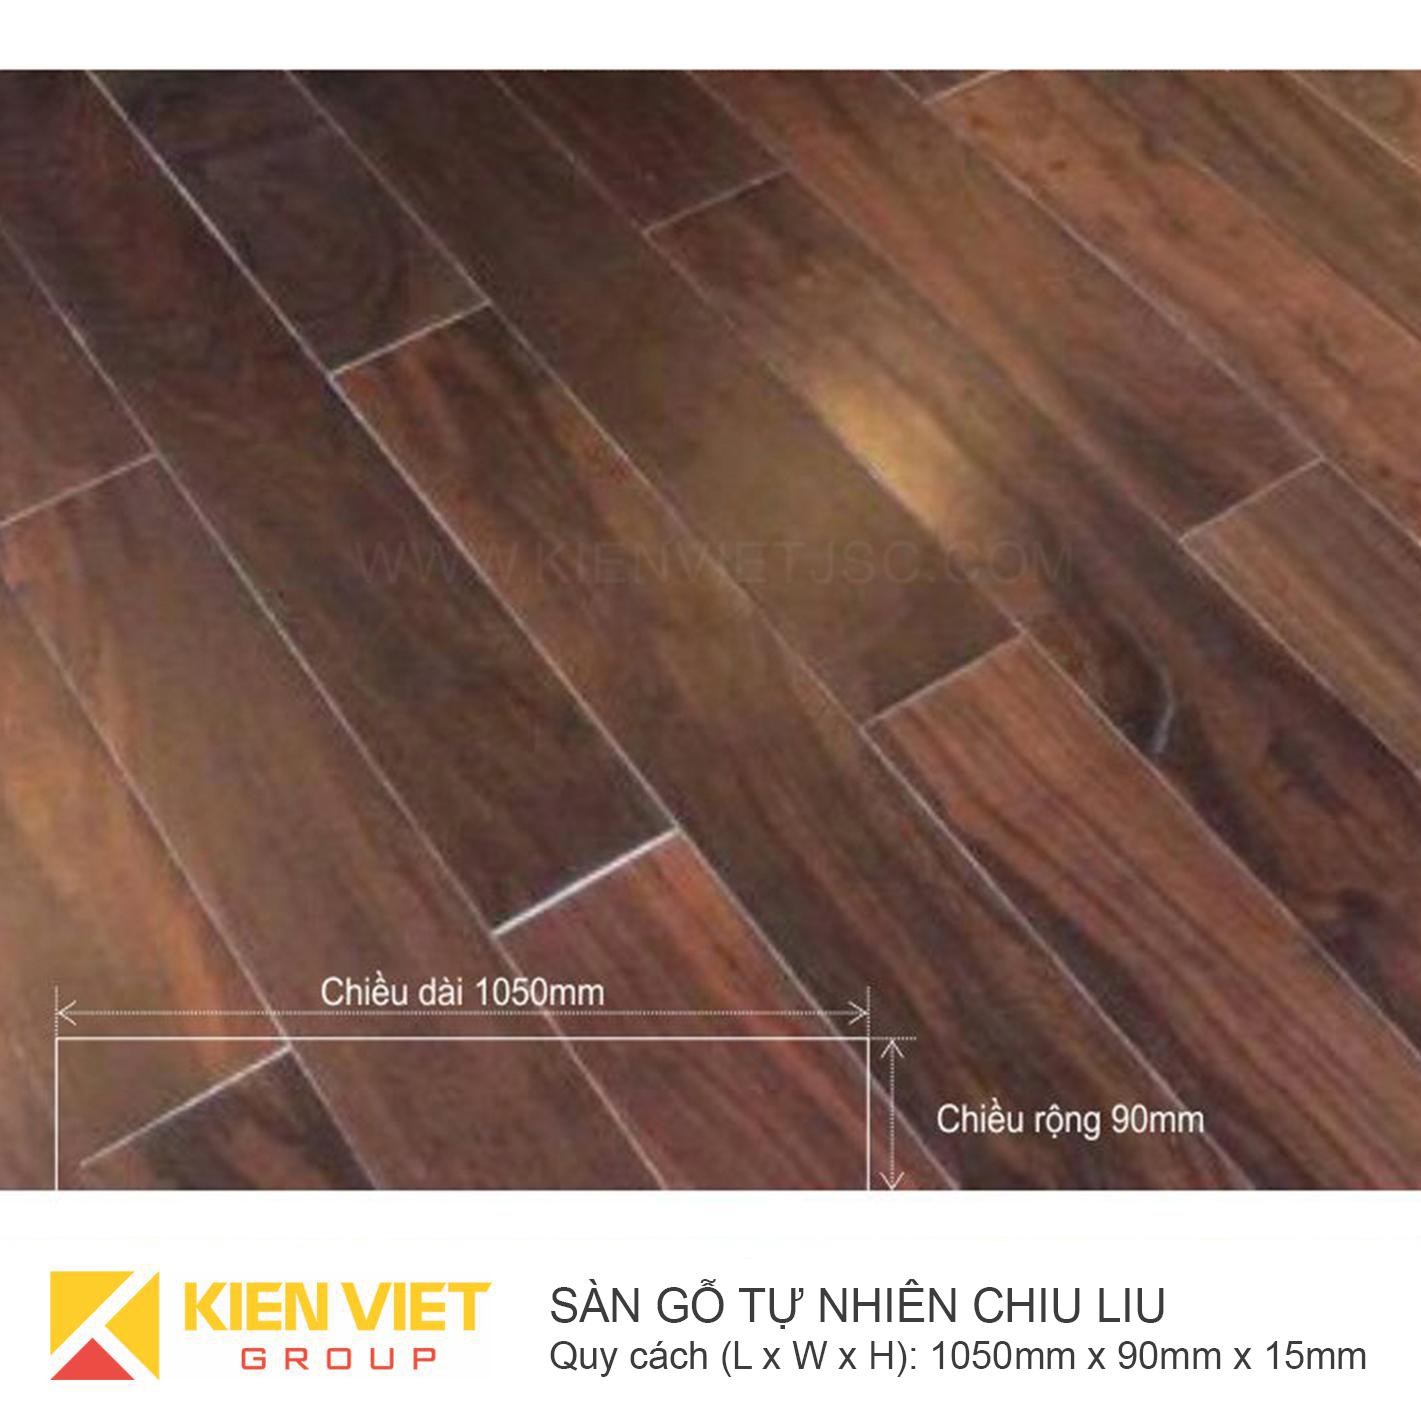 Sàn gỗ tự nhiên Chiu Liu 1050x15m